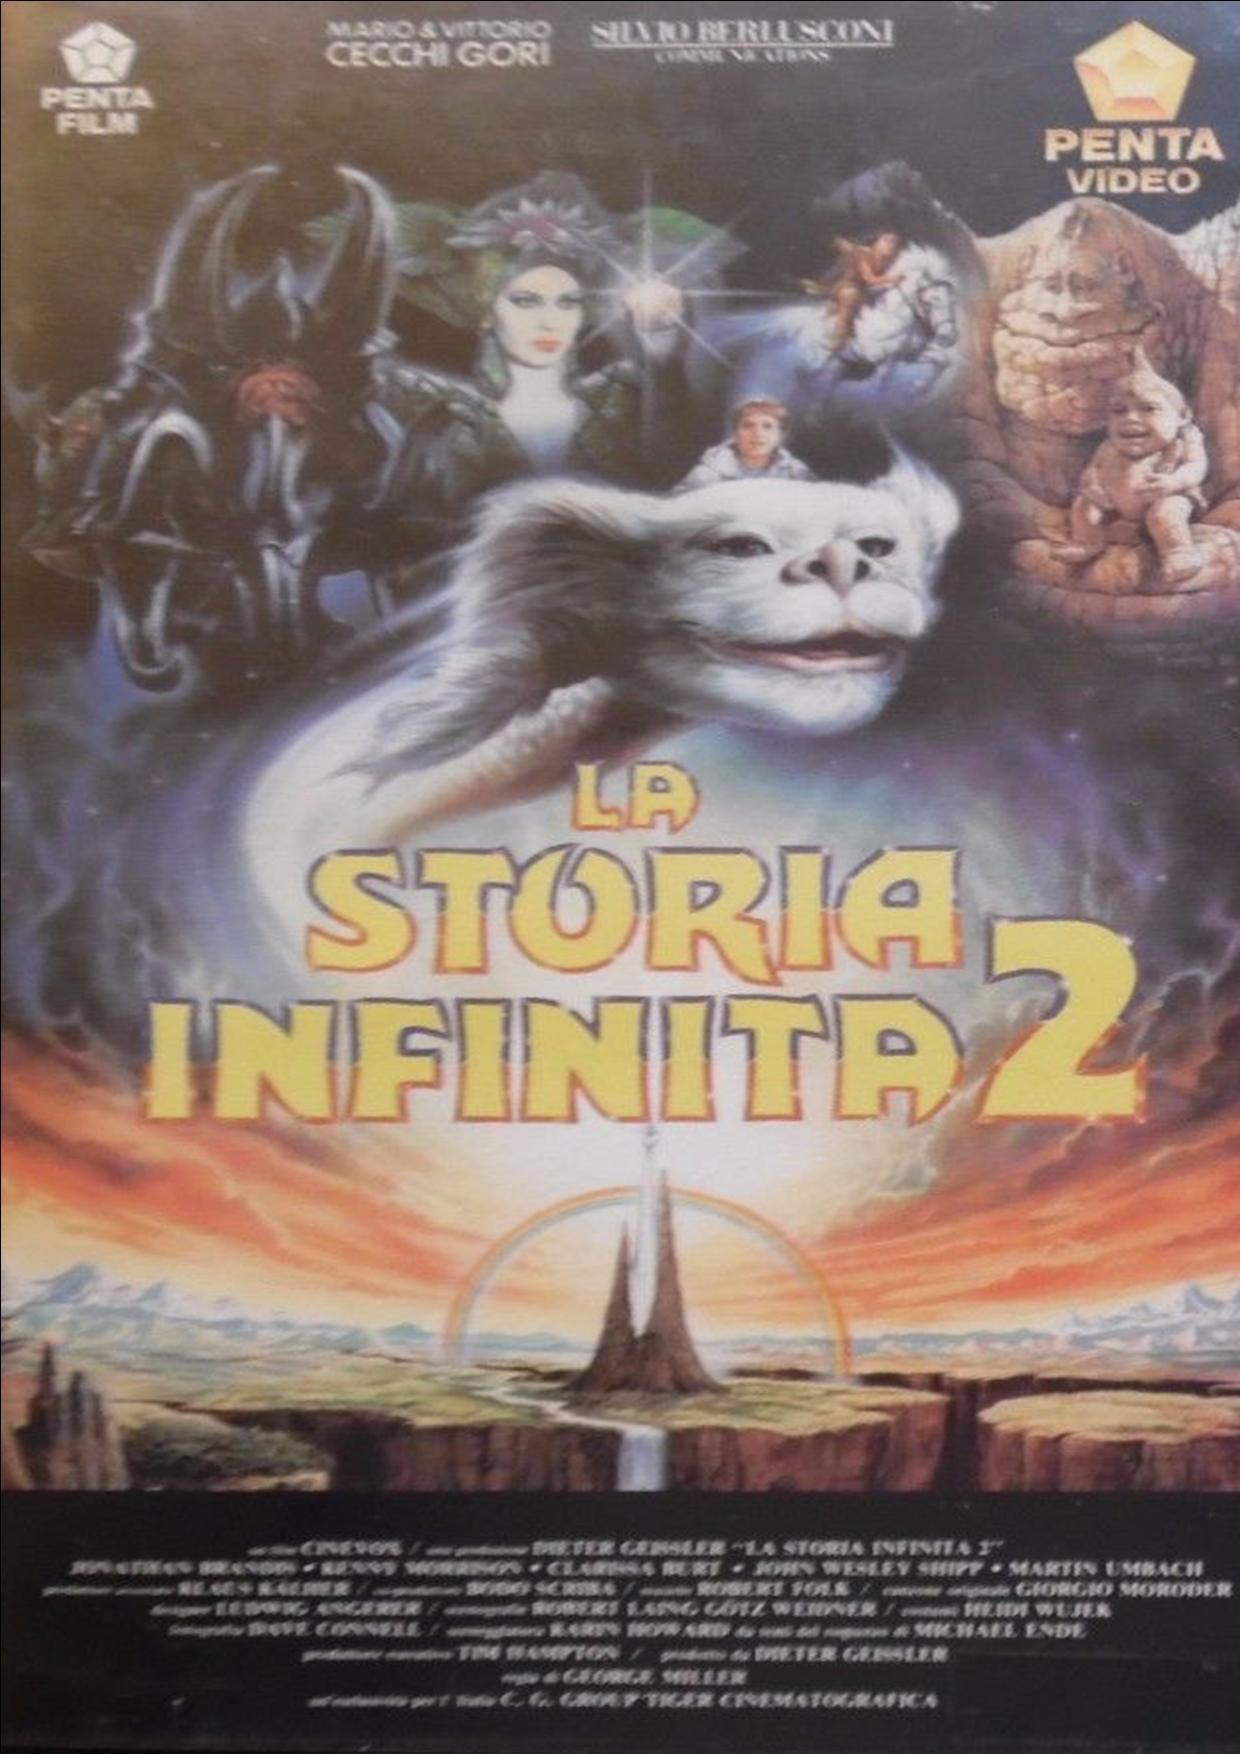 LA STORIA INFINITA 2 (VHS USATA EX NOLEGGIO) (VHS)